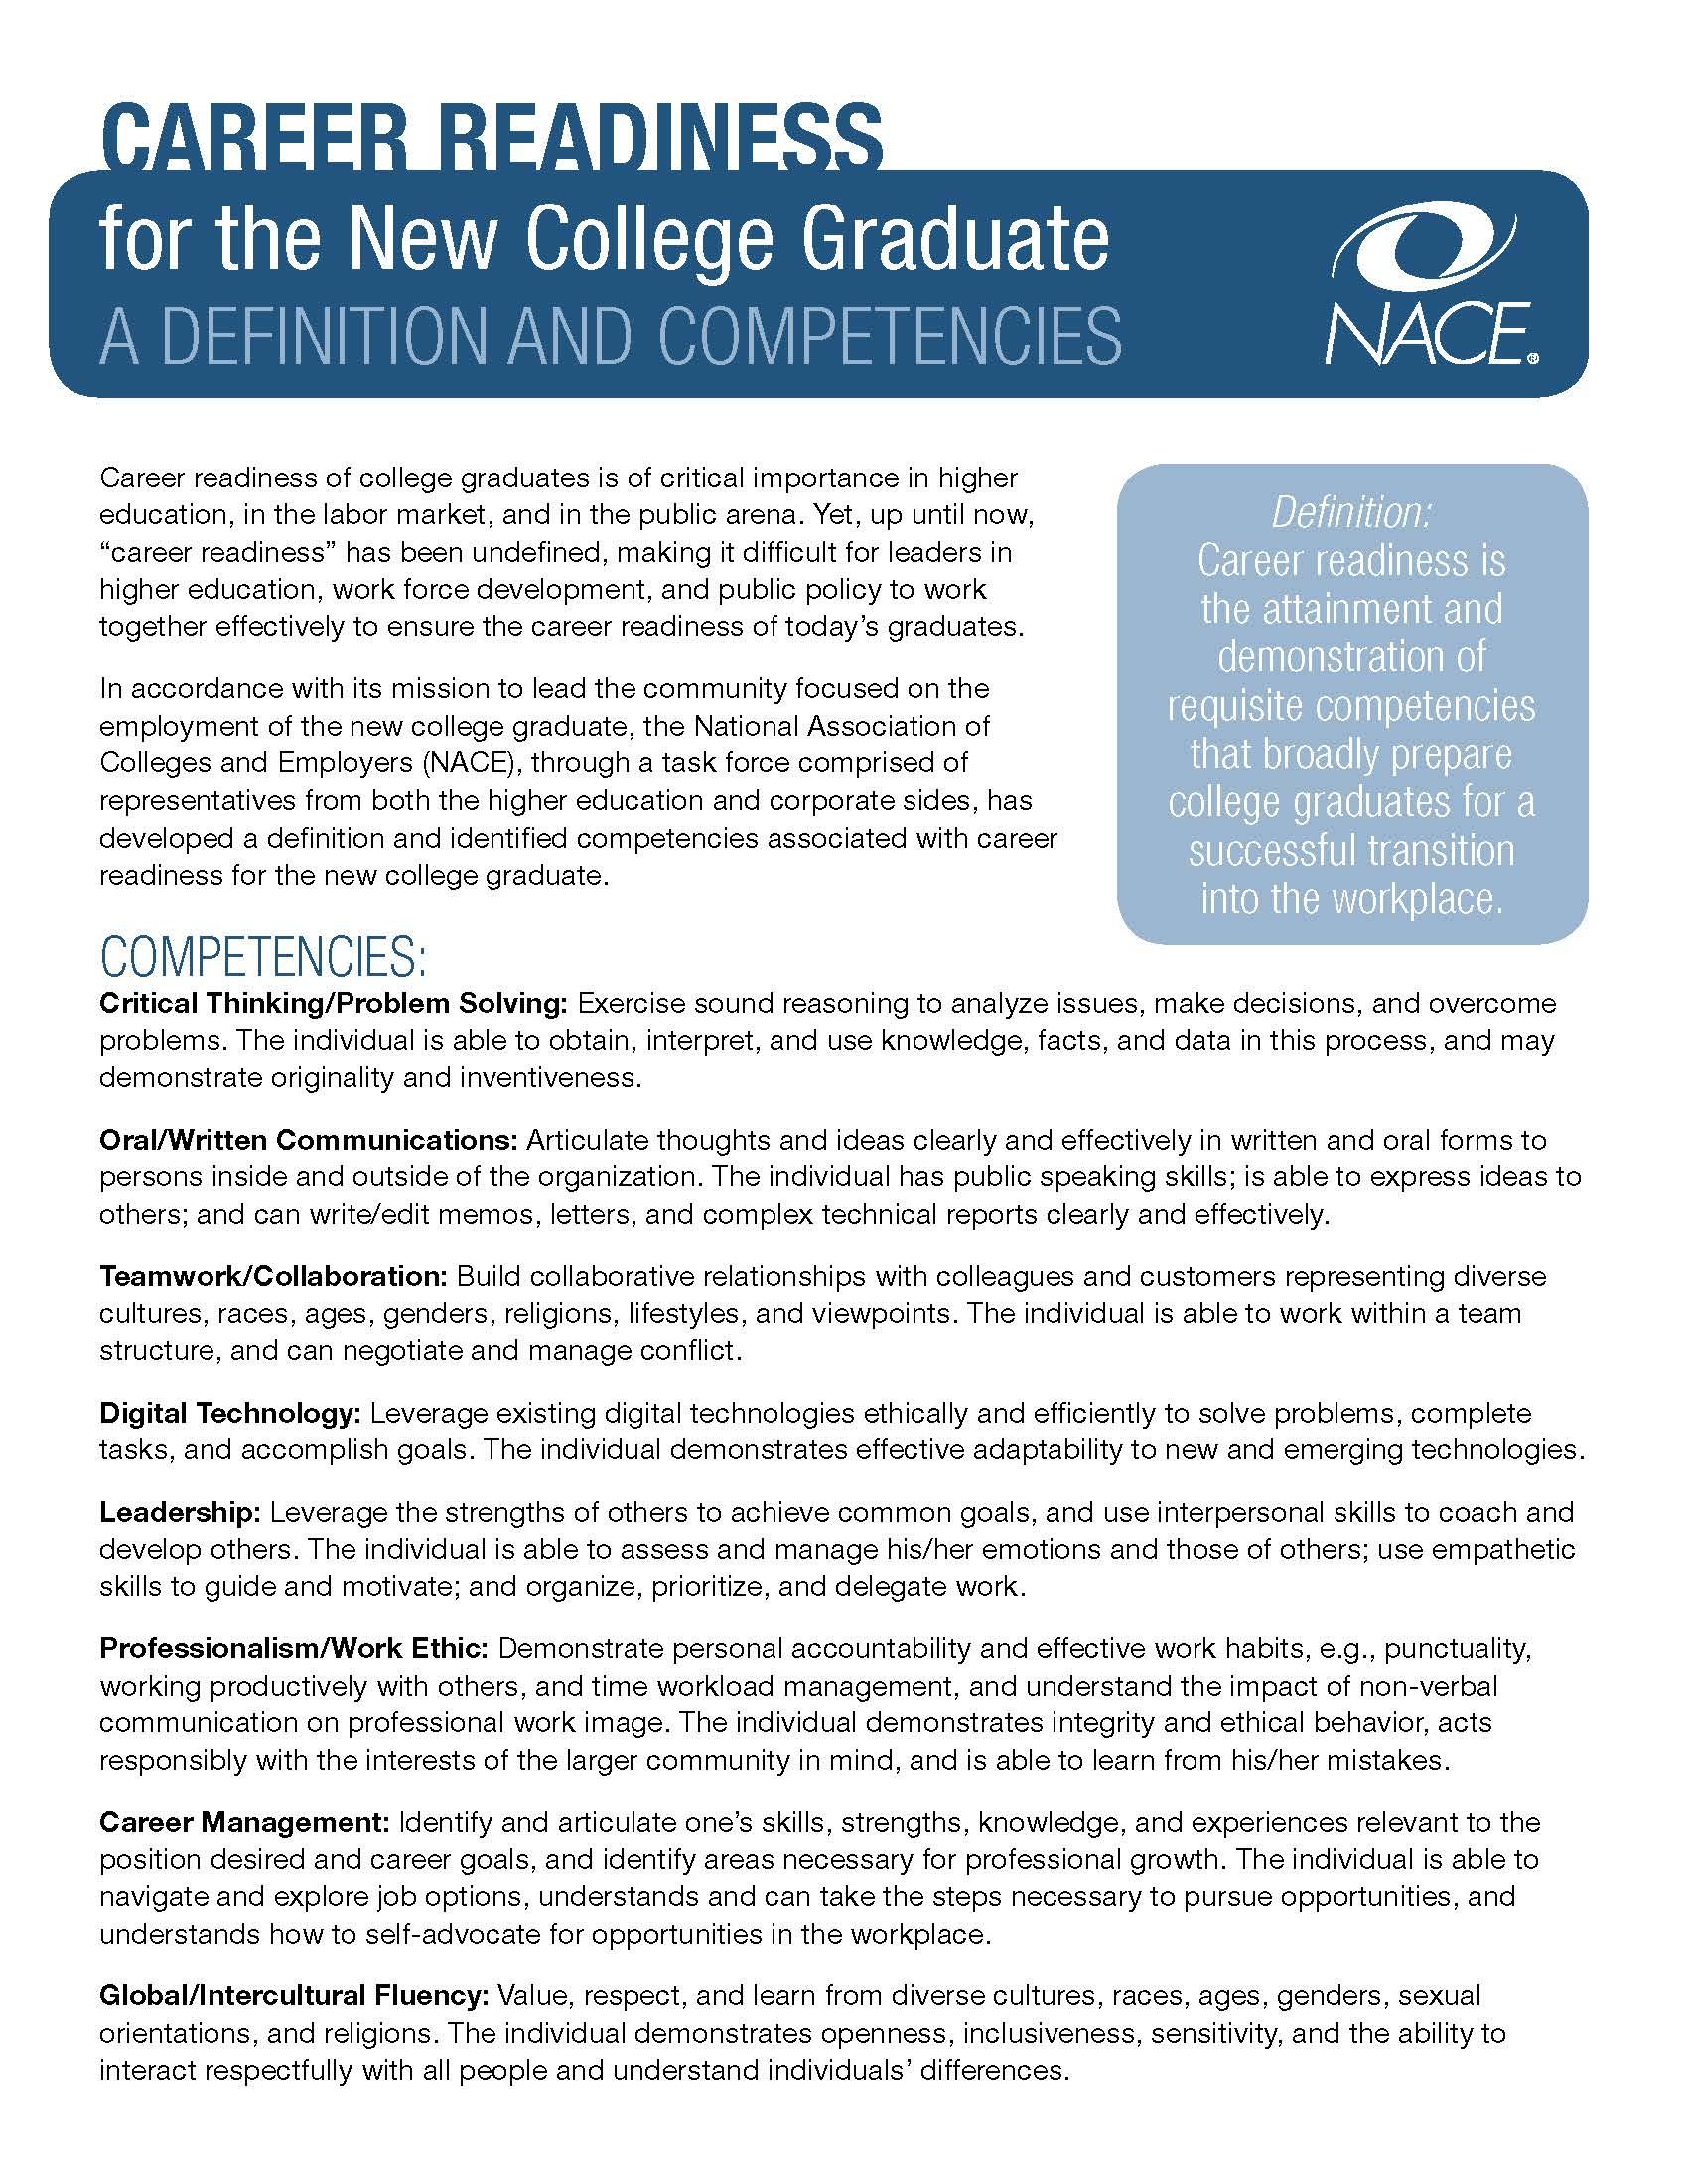 Internship Corner Career Readiness Competencies Career